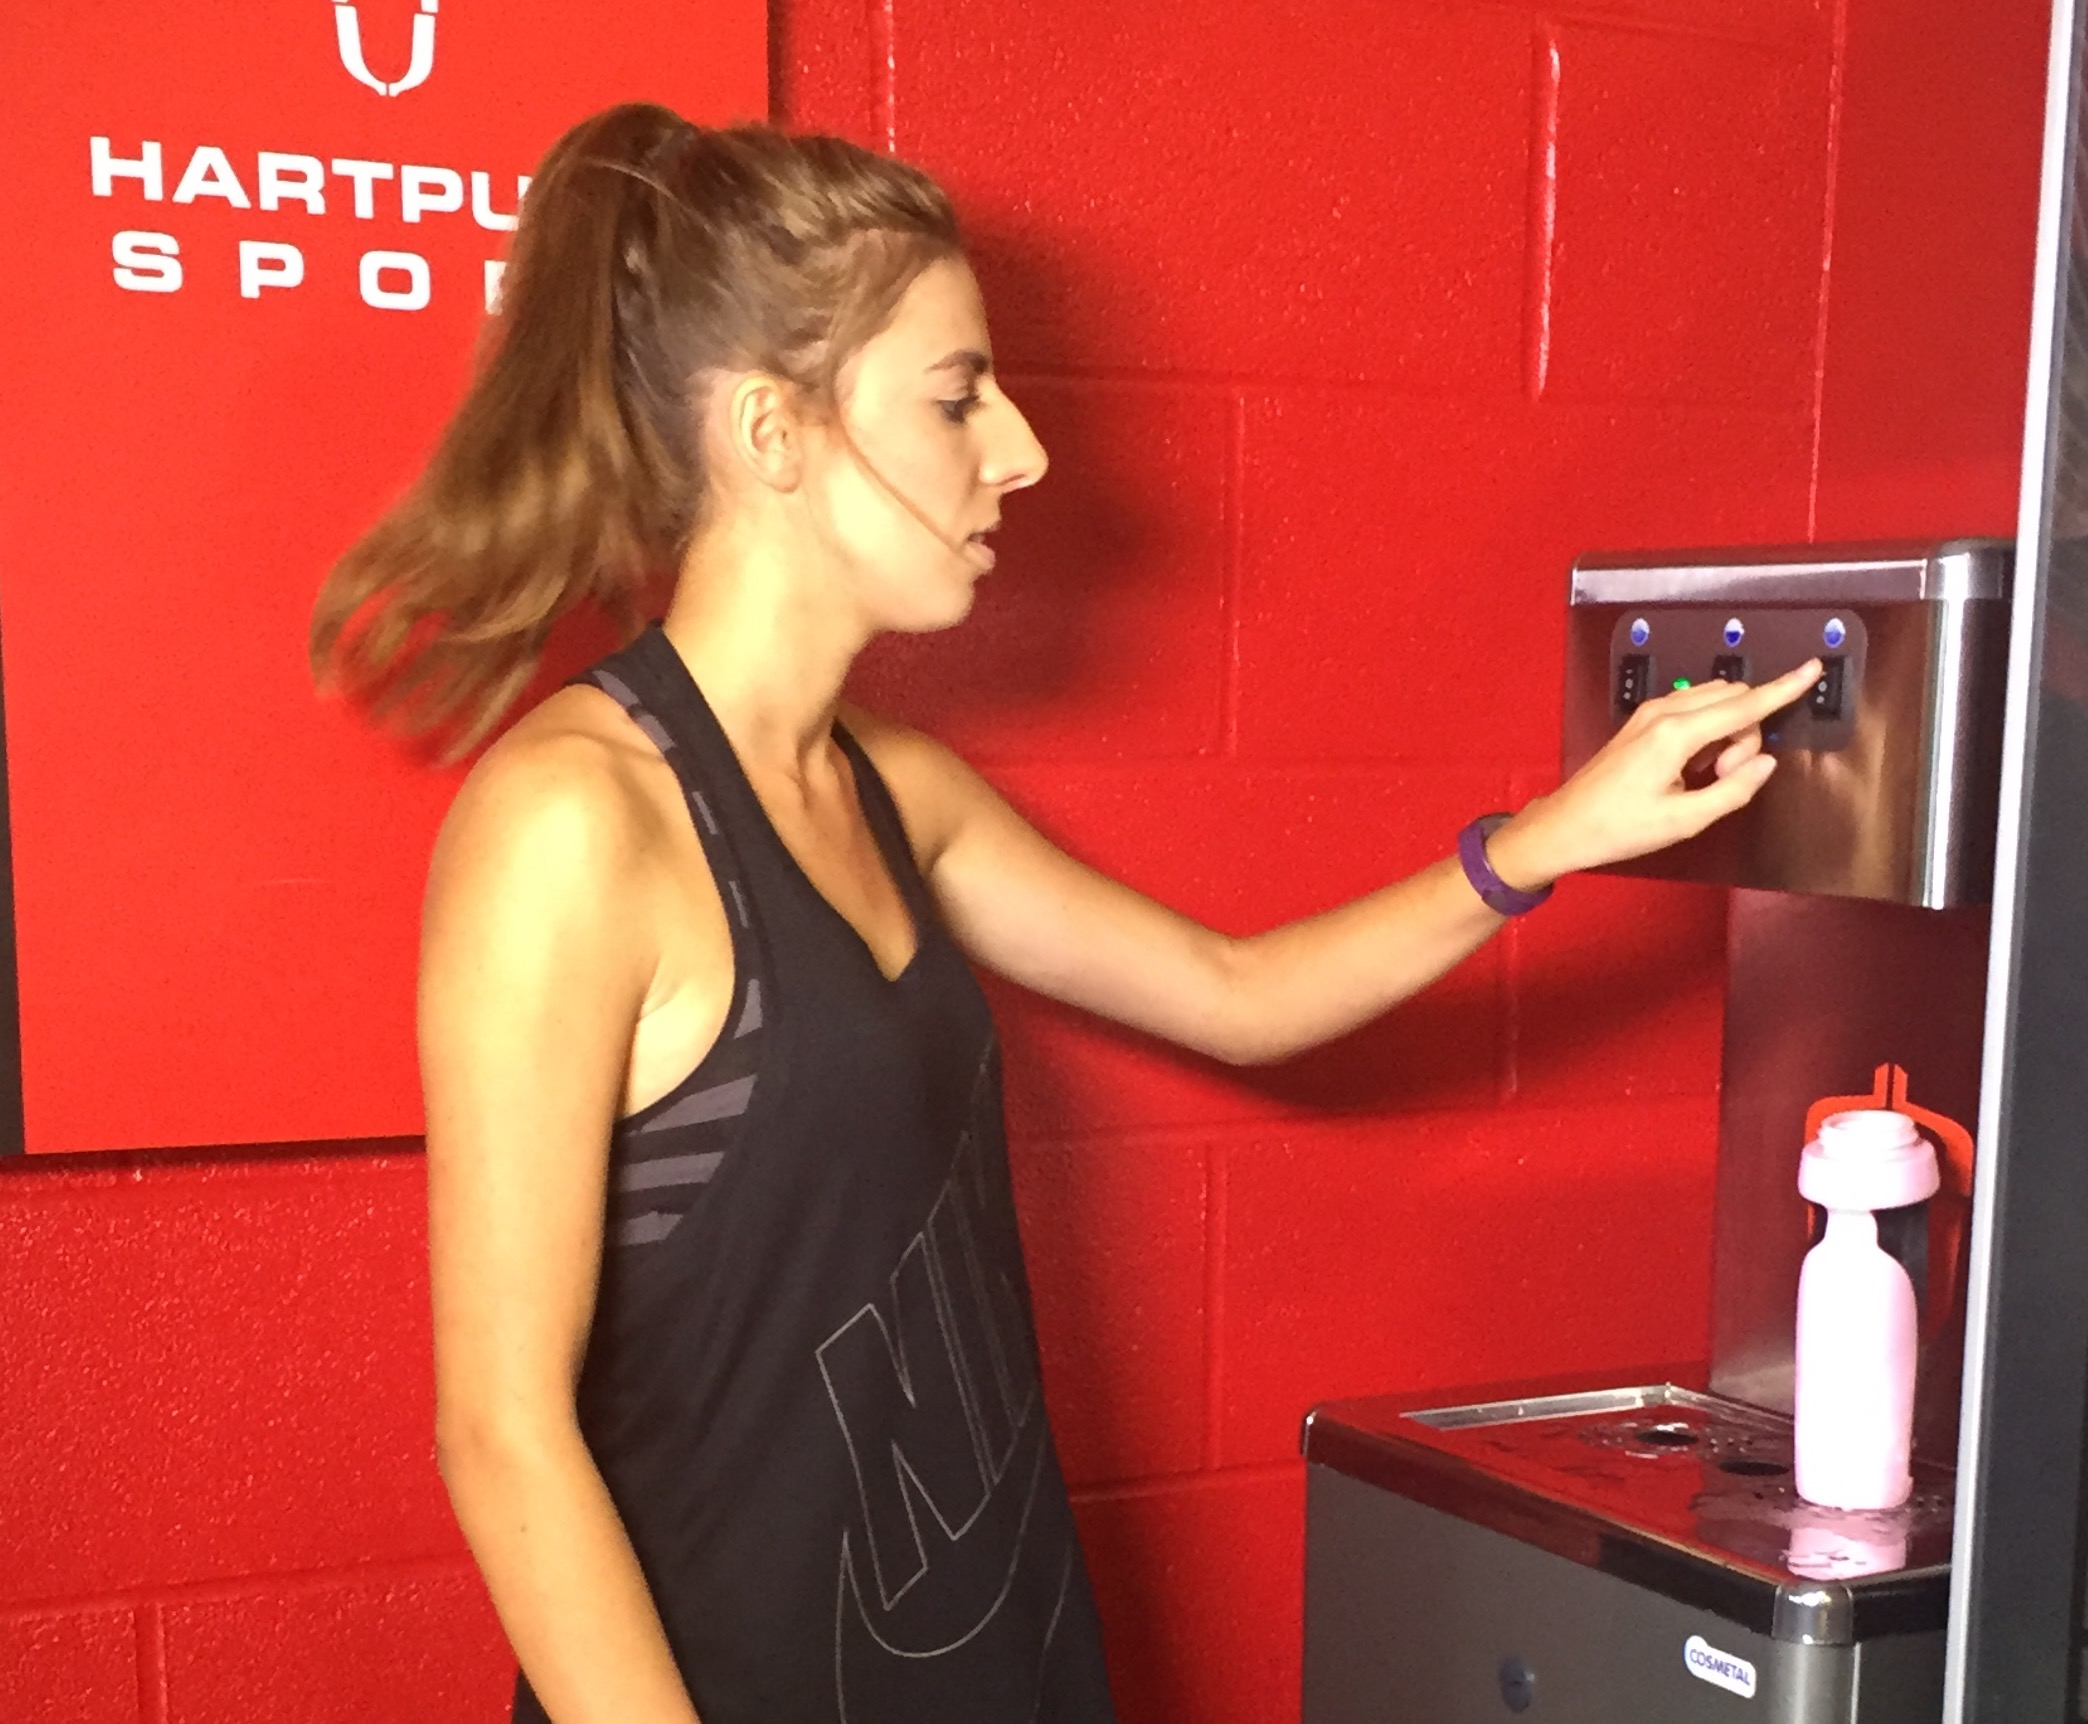 niagara-water-dispenser-in-gym